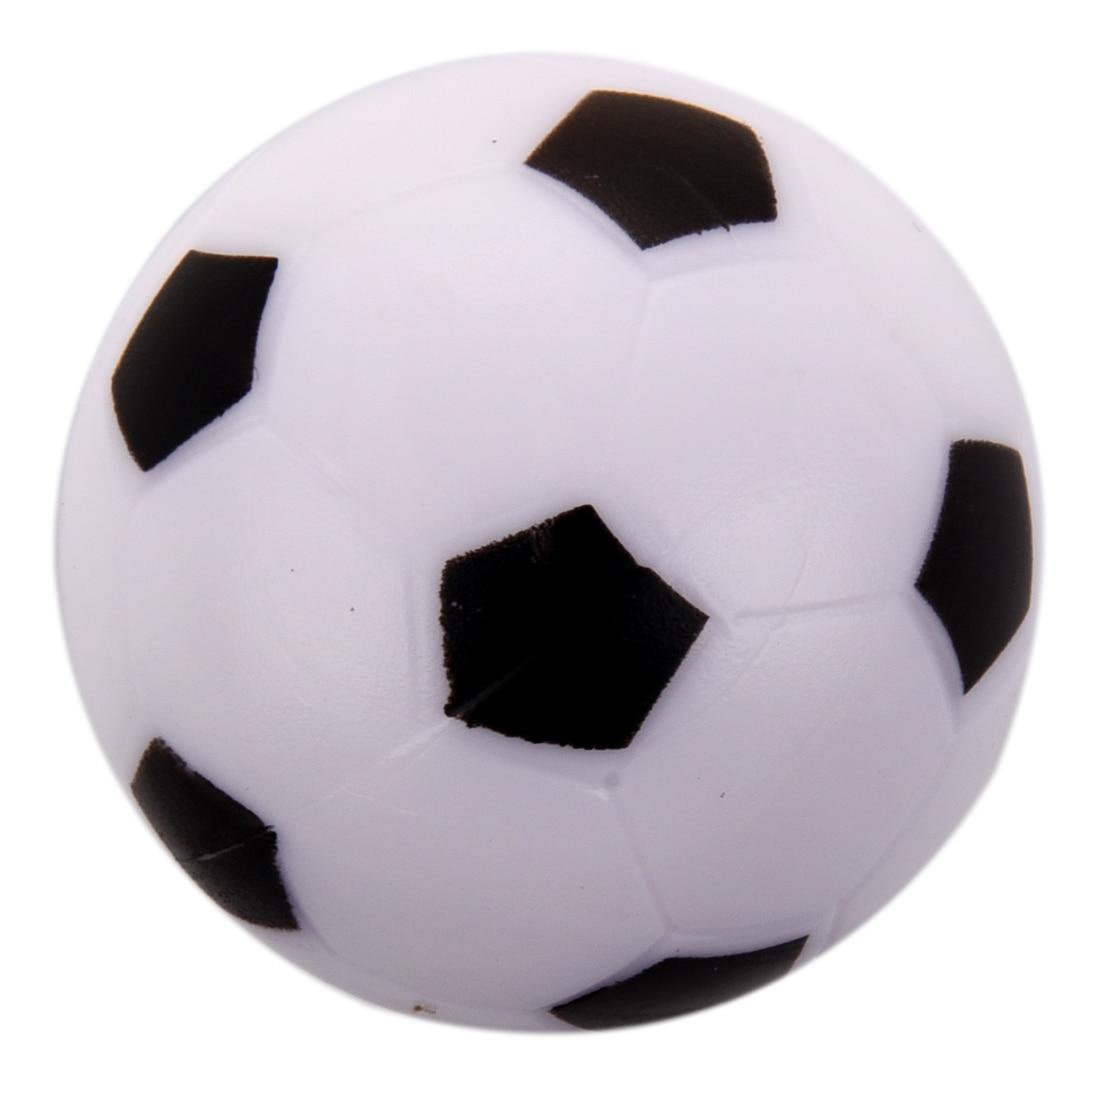 Pequeña pelota de fútbol pelota de mesa de plástico duro Homo logue niños juguete negro blanco